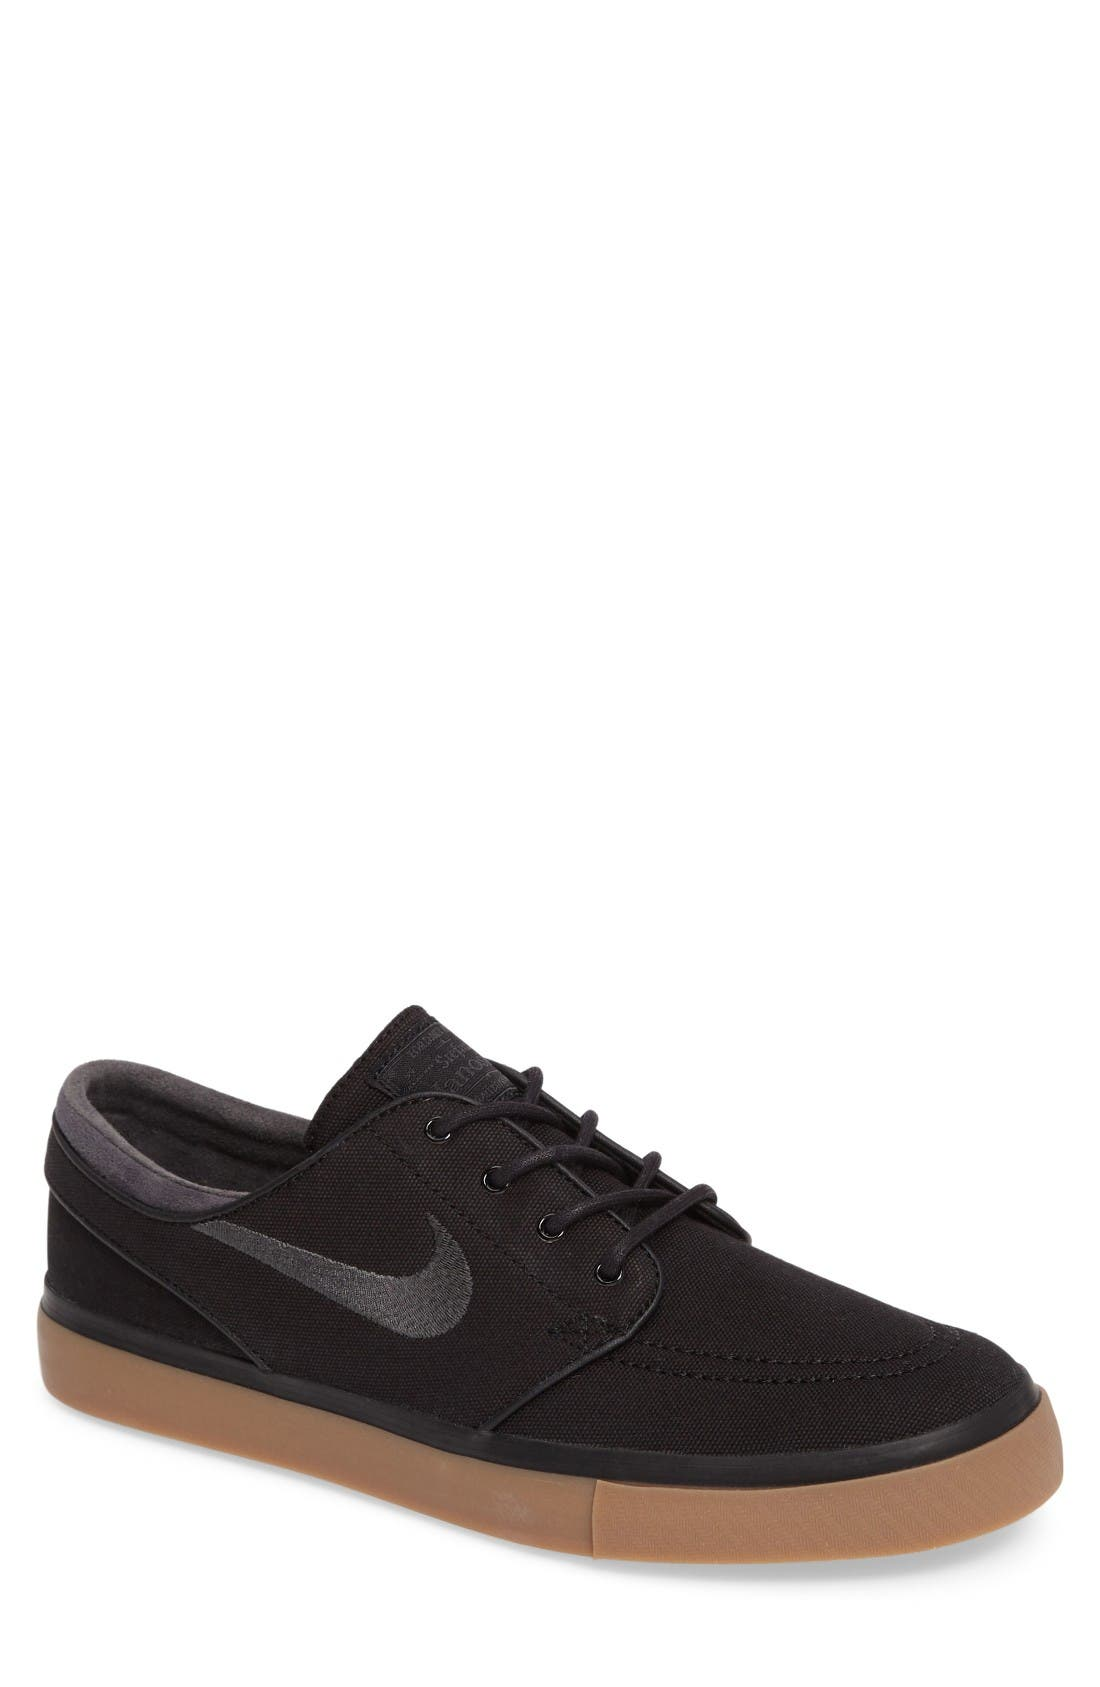 Alternate Image 1 Selected - Nike 'Zoom - Stefan Janoski' Skate Shoe (Men)